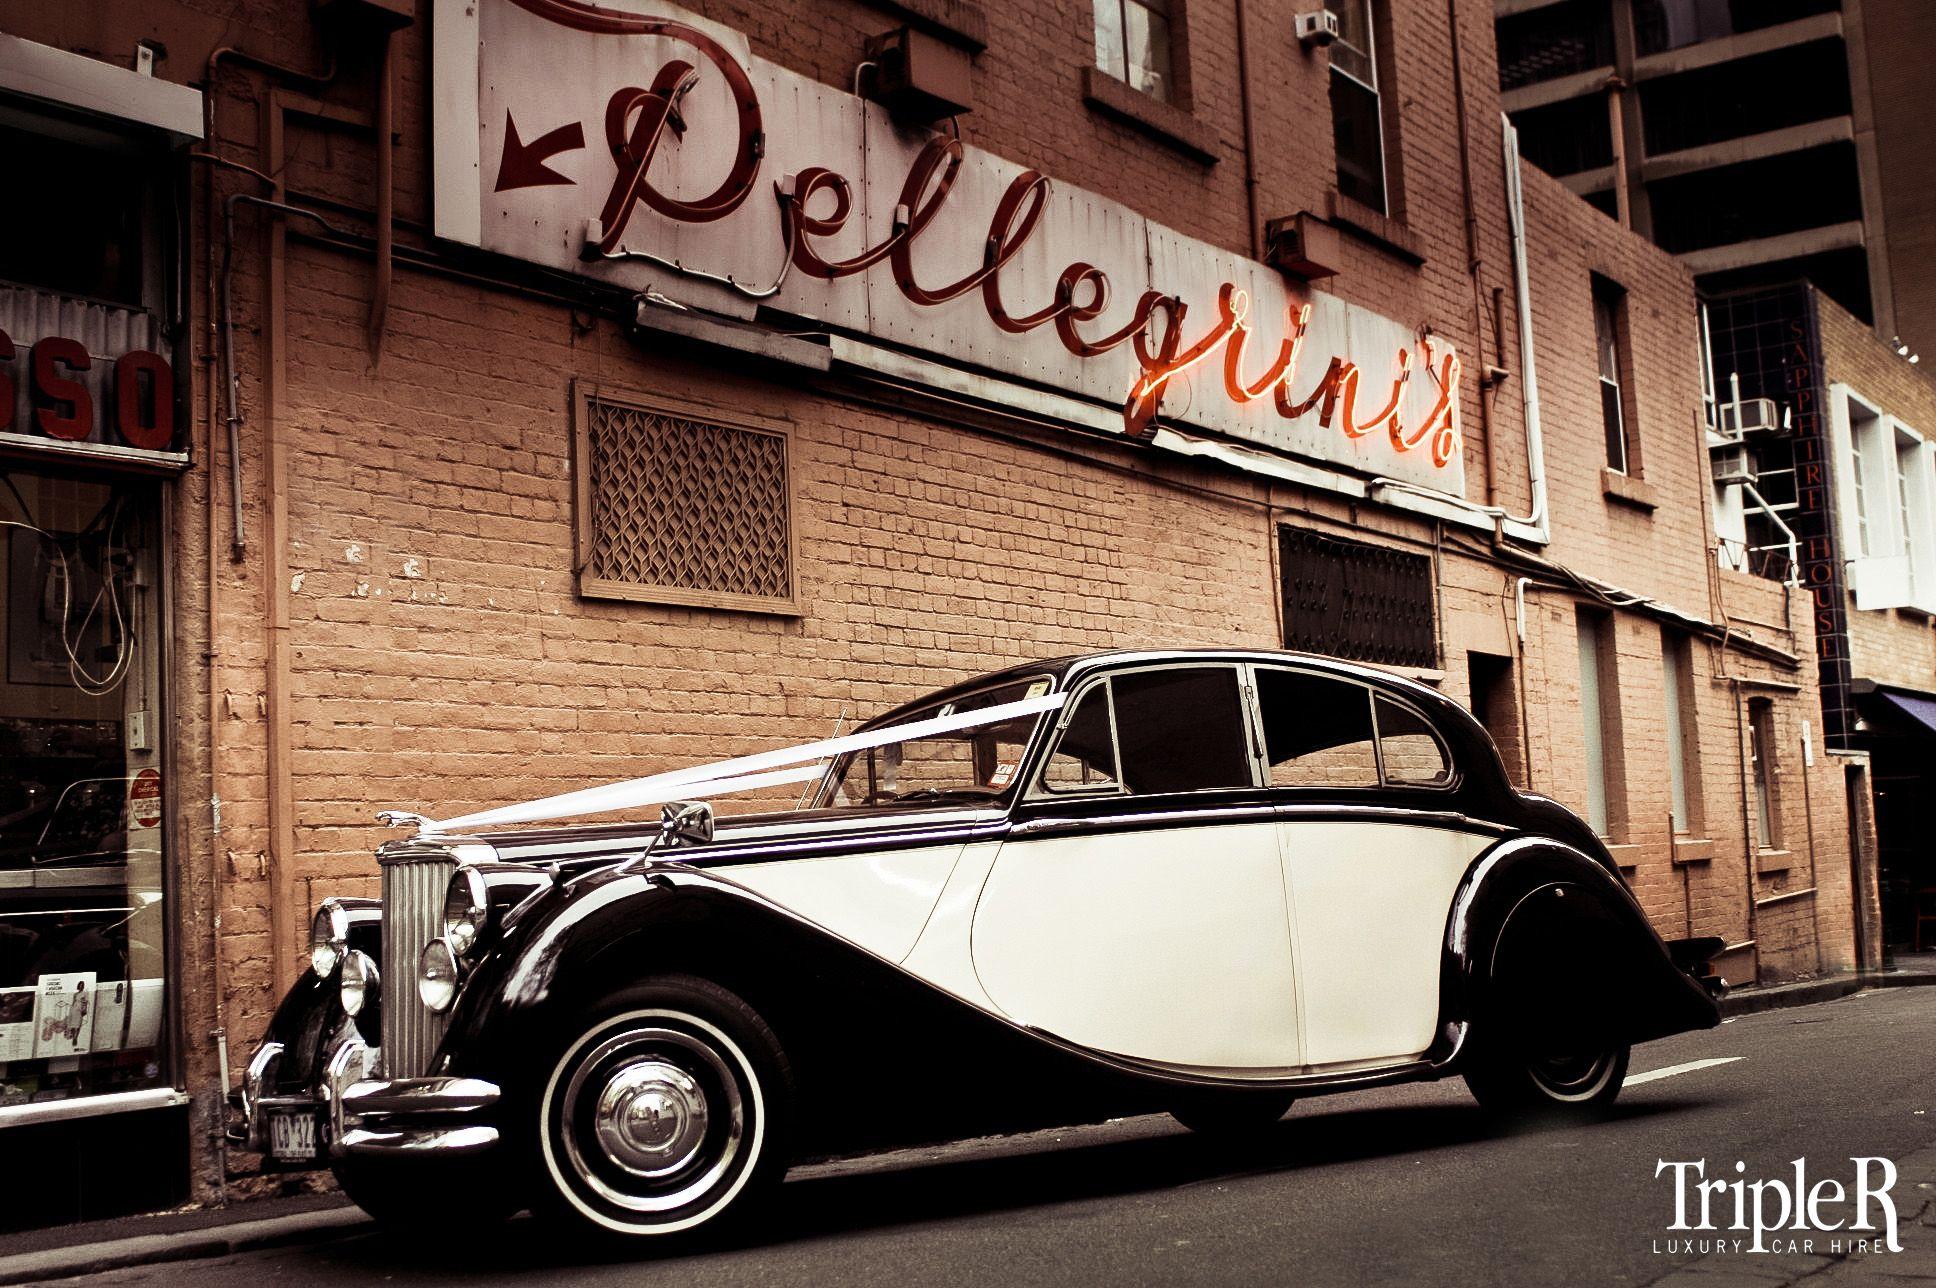 Www.tripler.com.au The Seductive Lines Of The Two Tone Jaguar Mk5. Home  WeddingWedding CarsMelbourne ...